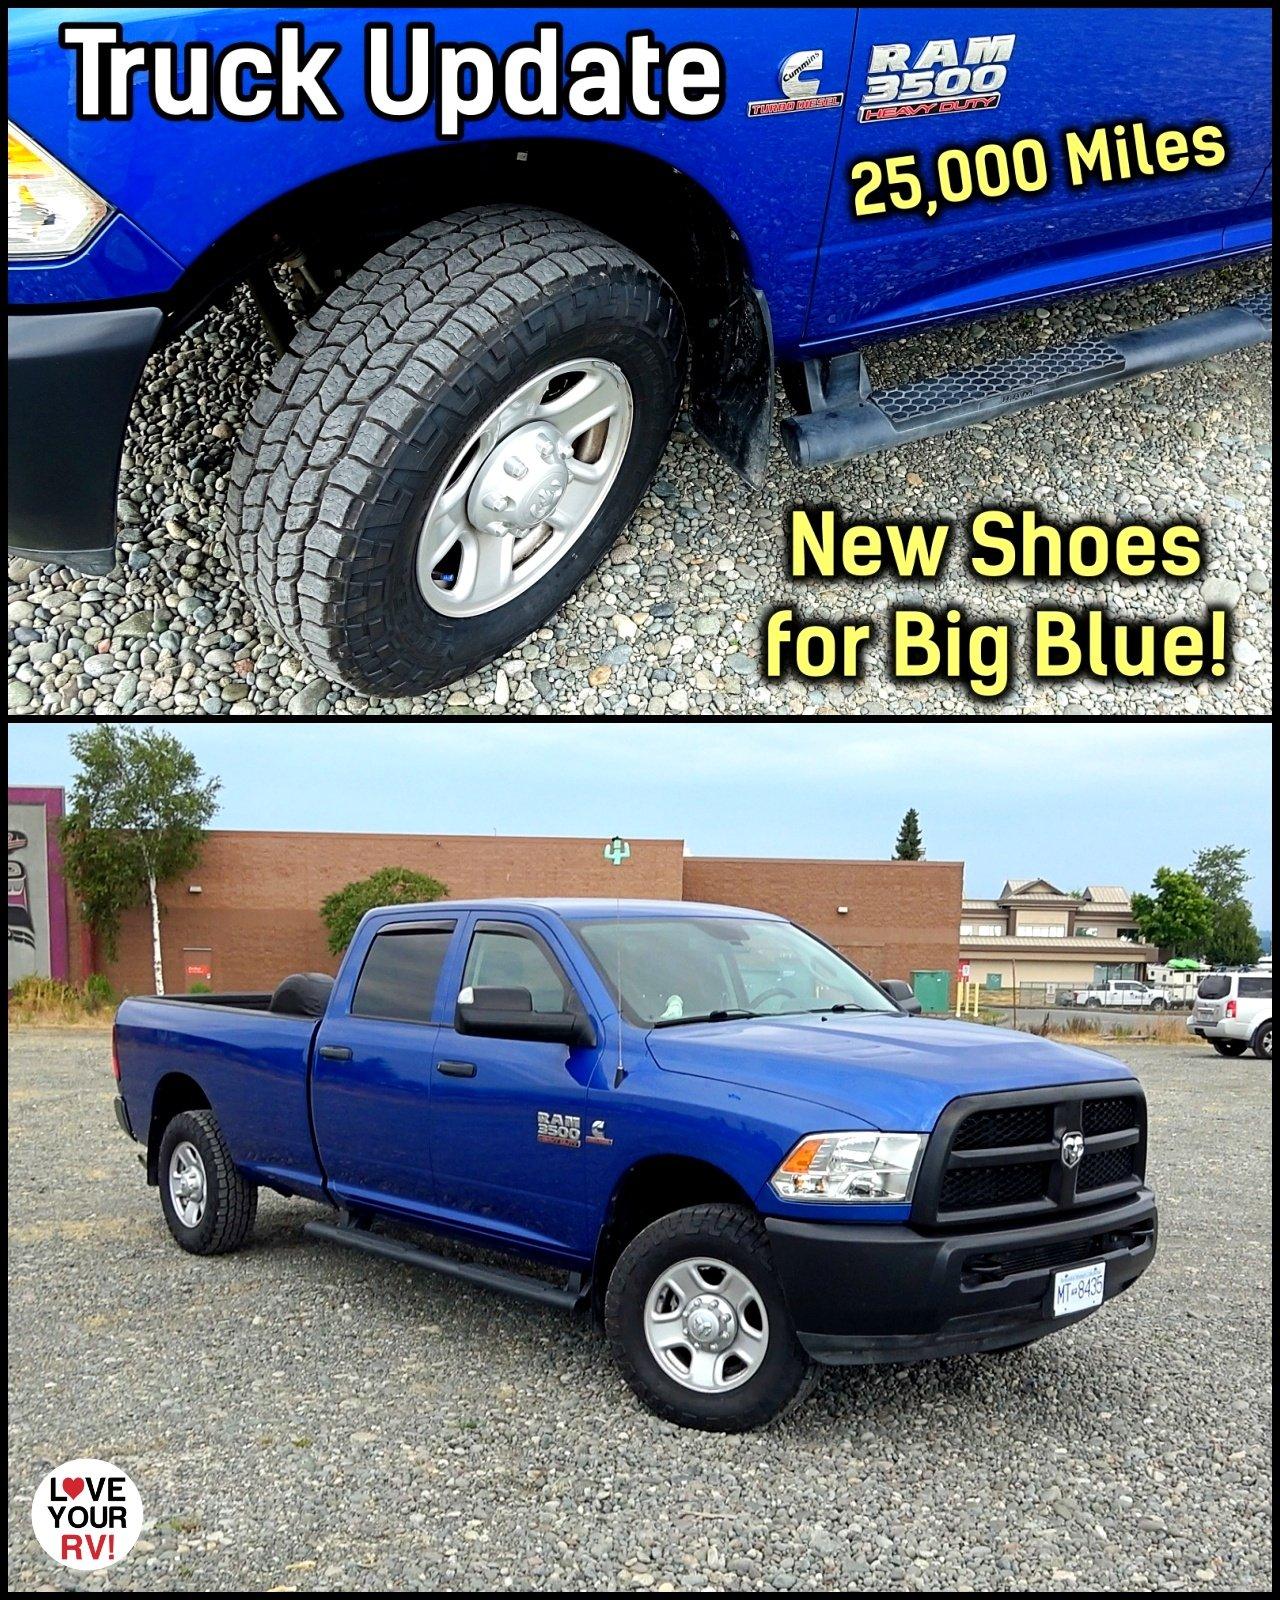 25000 Mile Ram Truck Update - New Cooper Tires & DEF Question